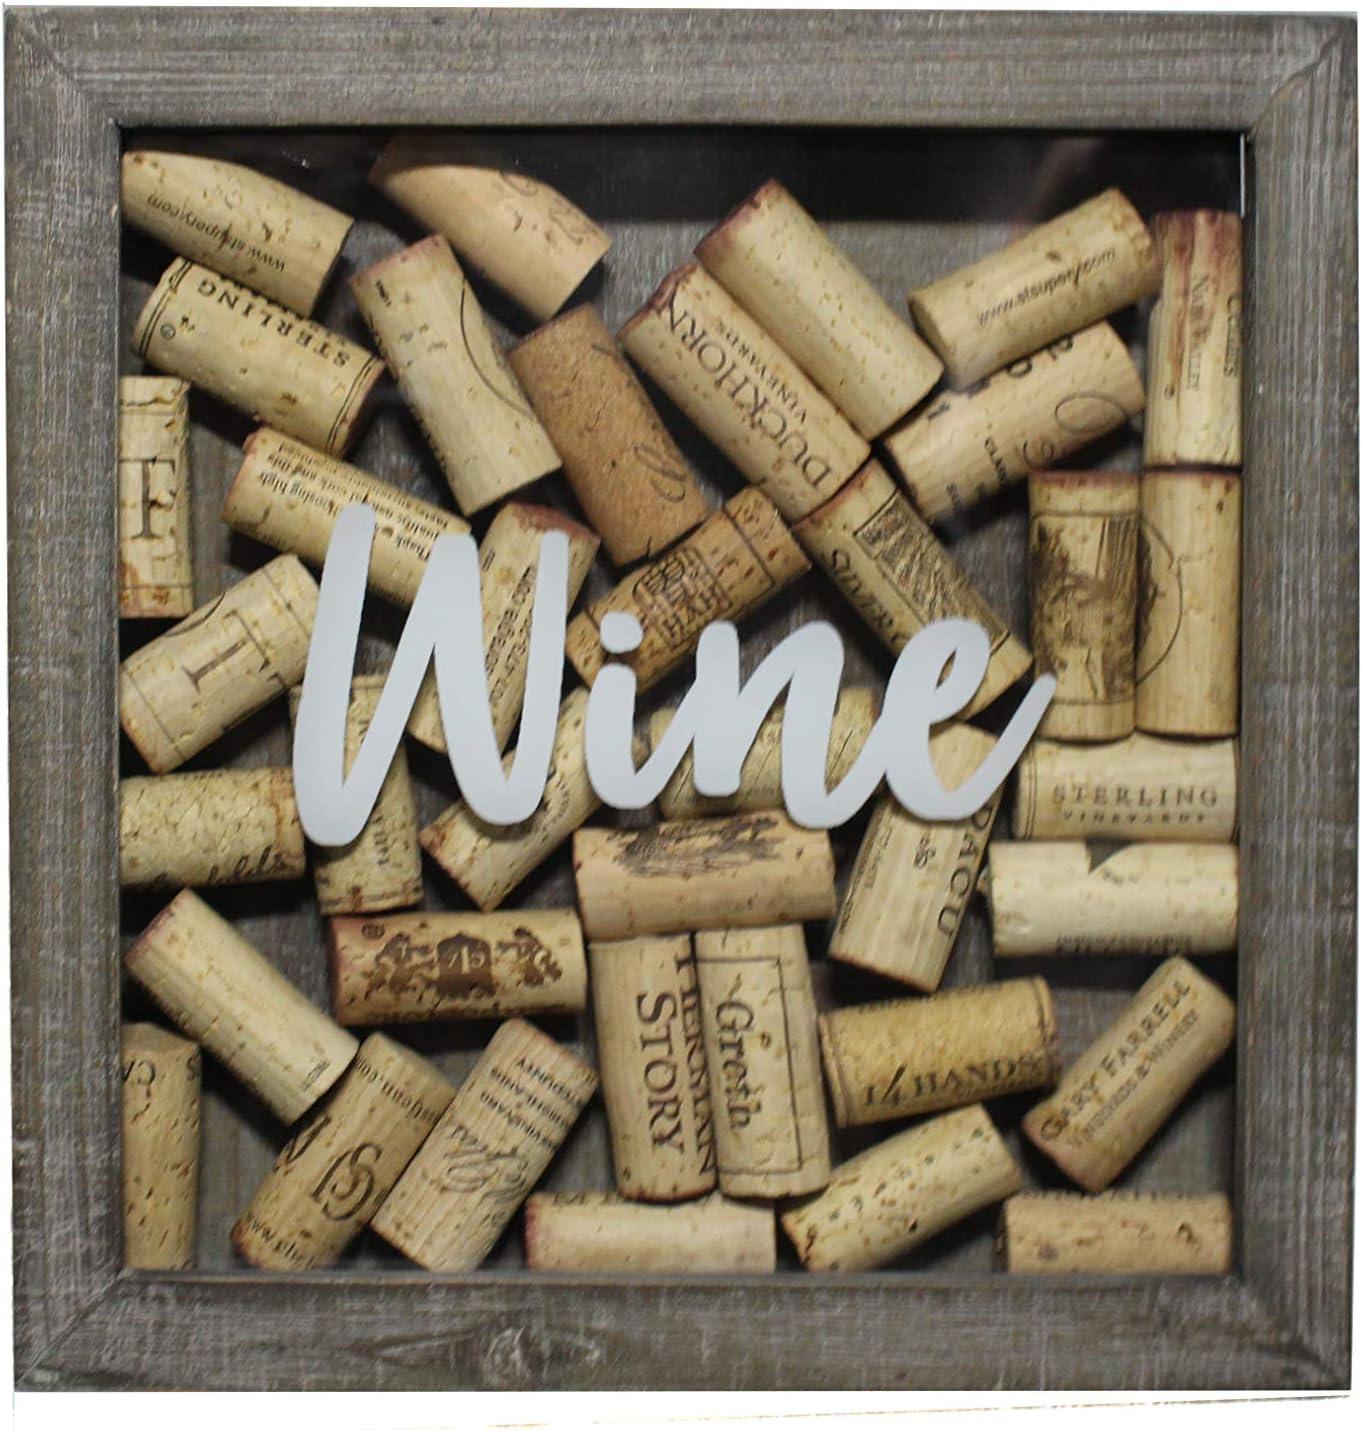 Barley & Vine Wine Cork Shadow Box - Rustic Gray - Quality Wood - Displays ~40 Corks - Easy Open Back - 10 x 10 in. - Metal Hanger Included